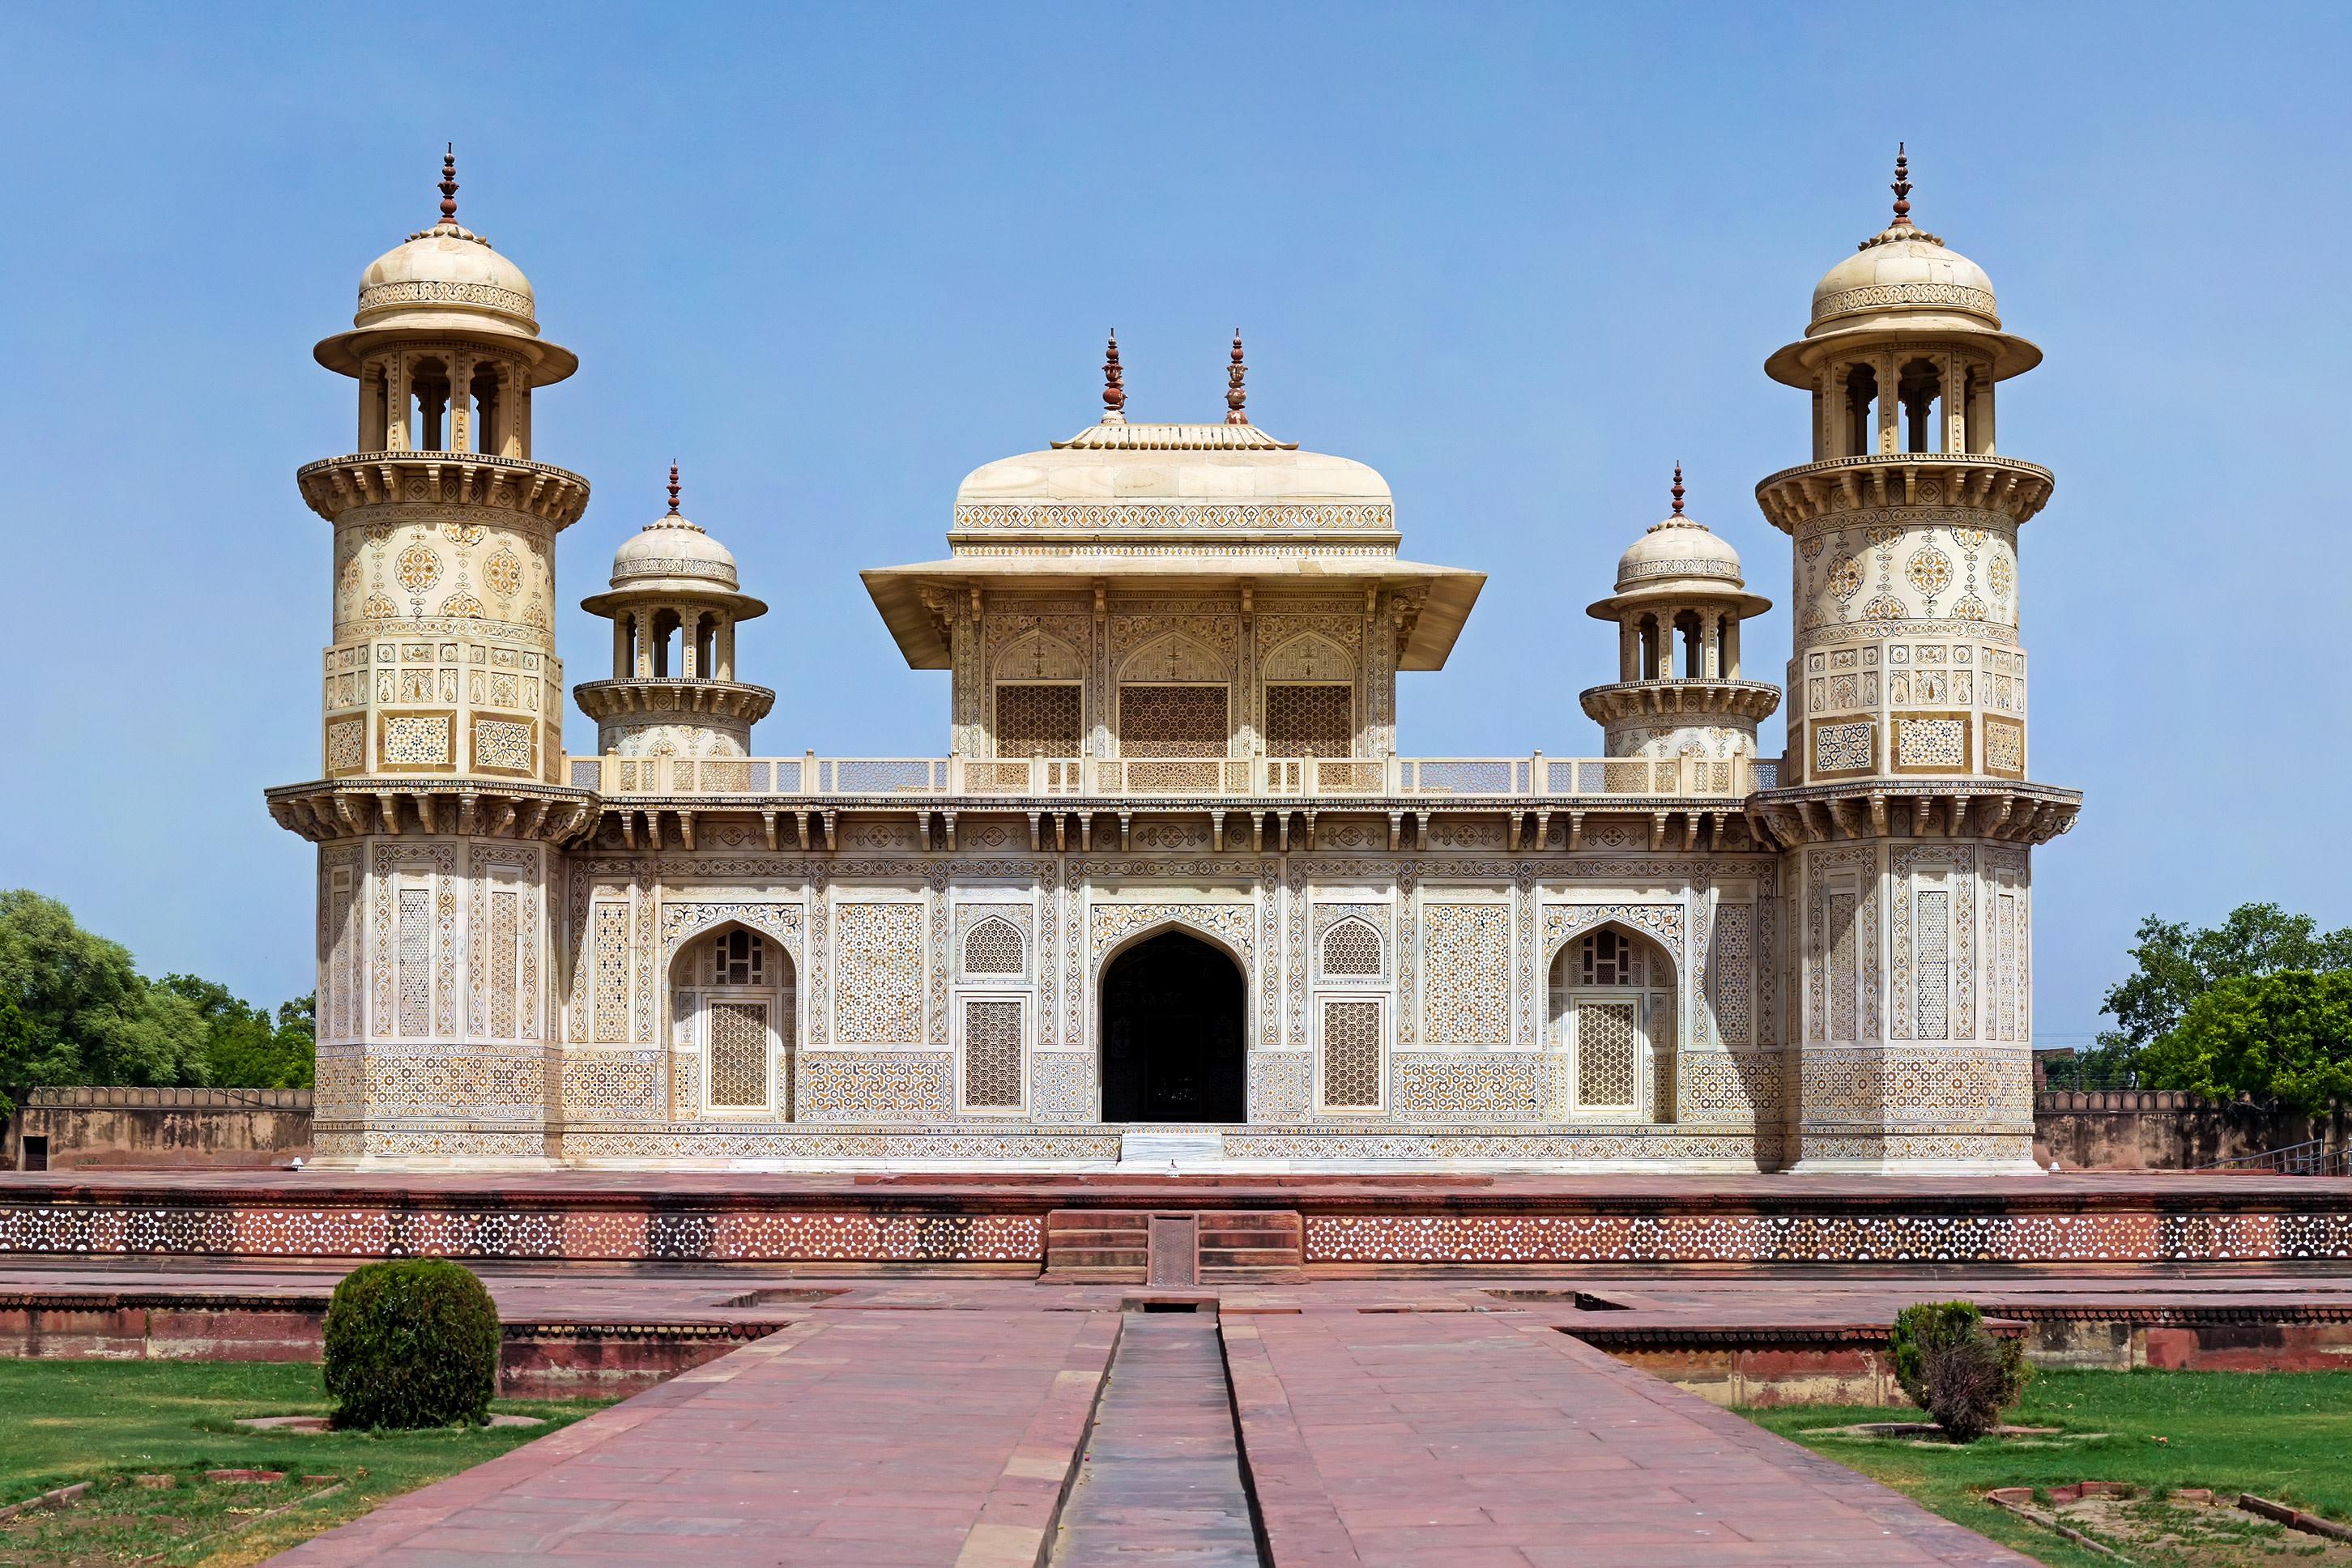 Tomb of Itimad-Ud-Daulah, Agra